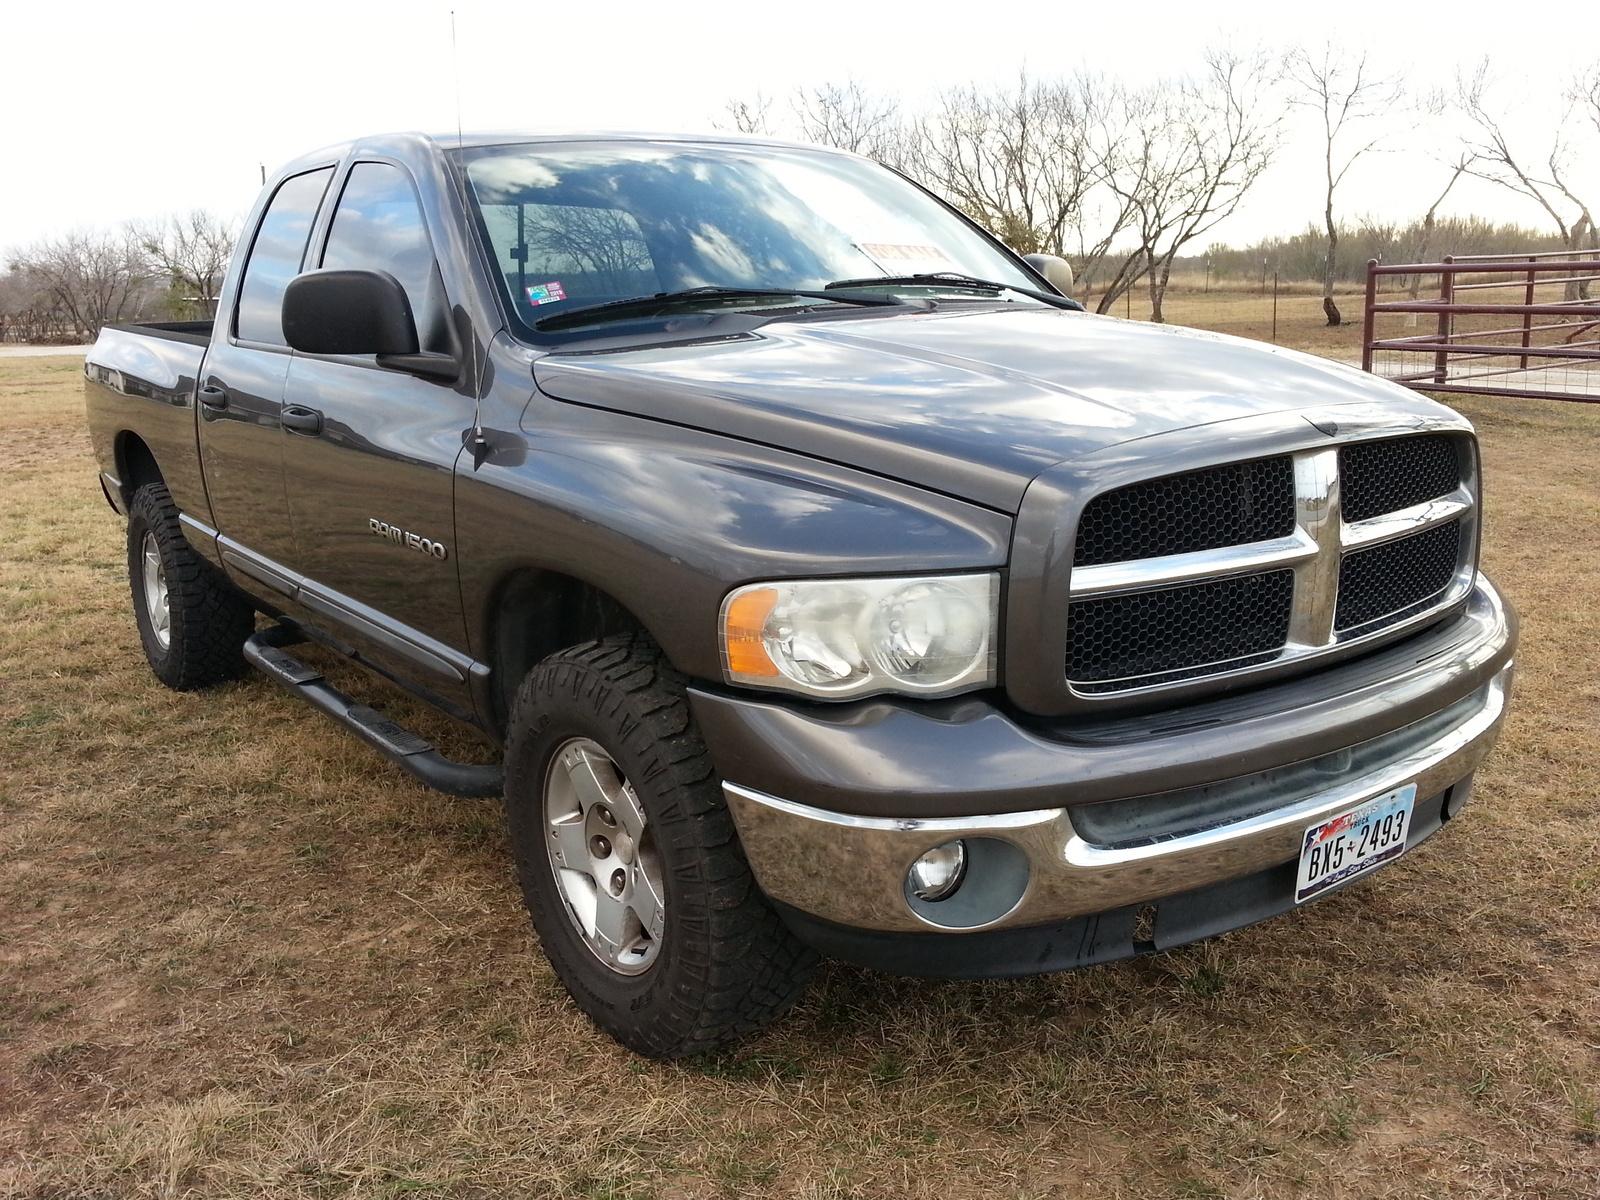 2003 Dodge Ram Pickup 1500 - Pictures